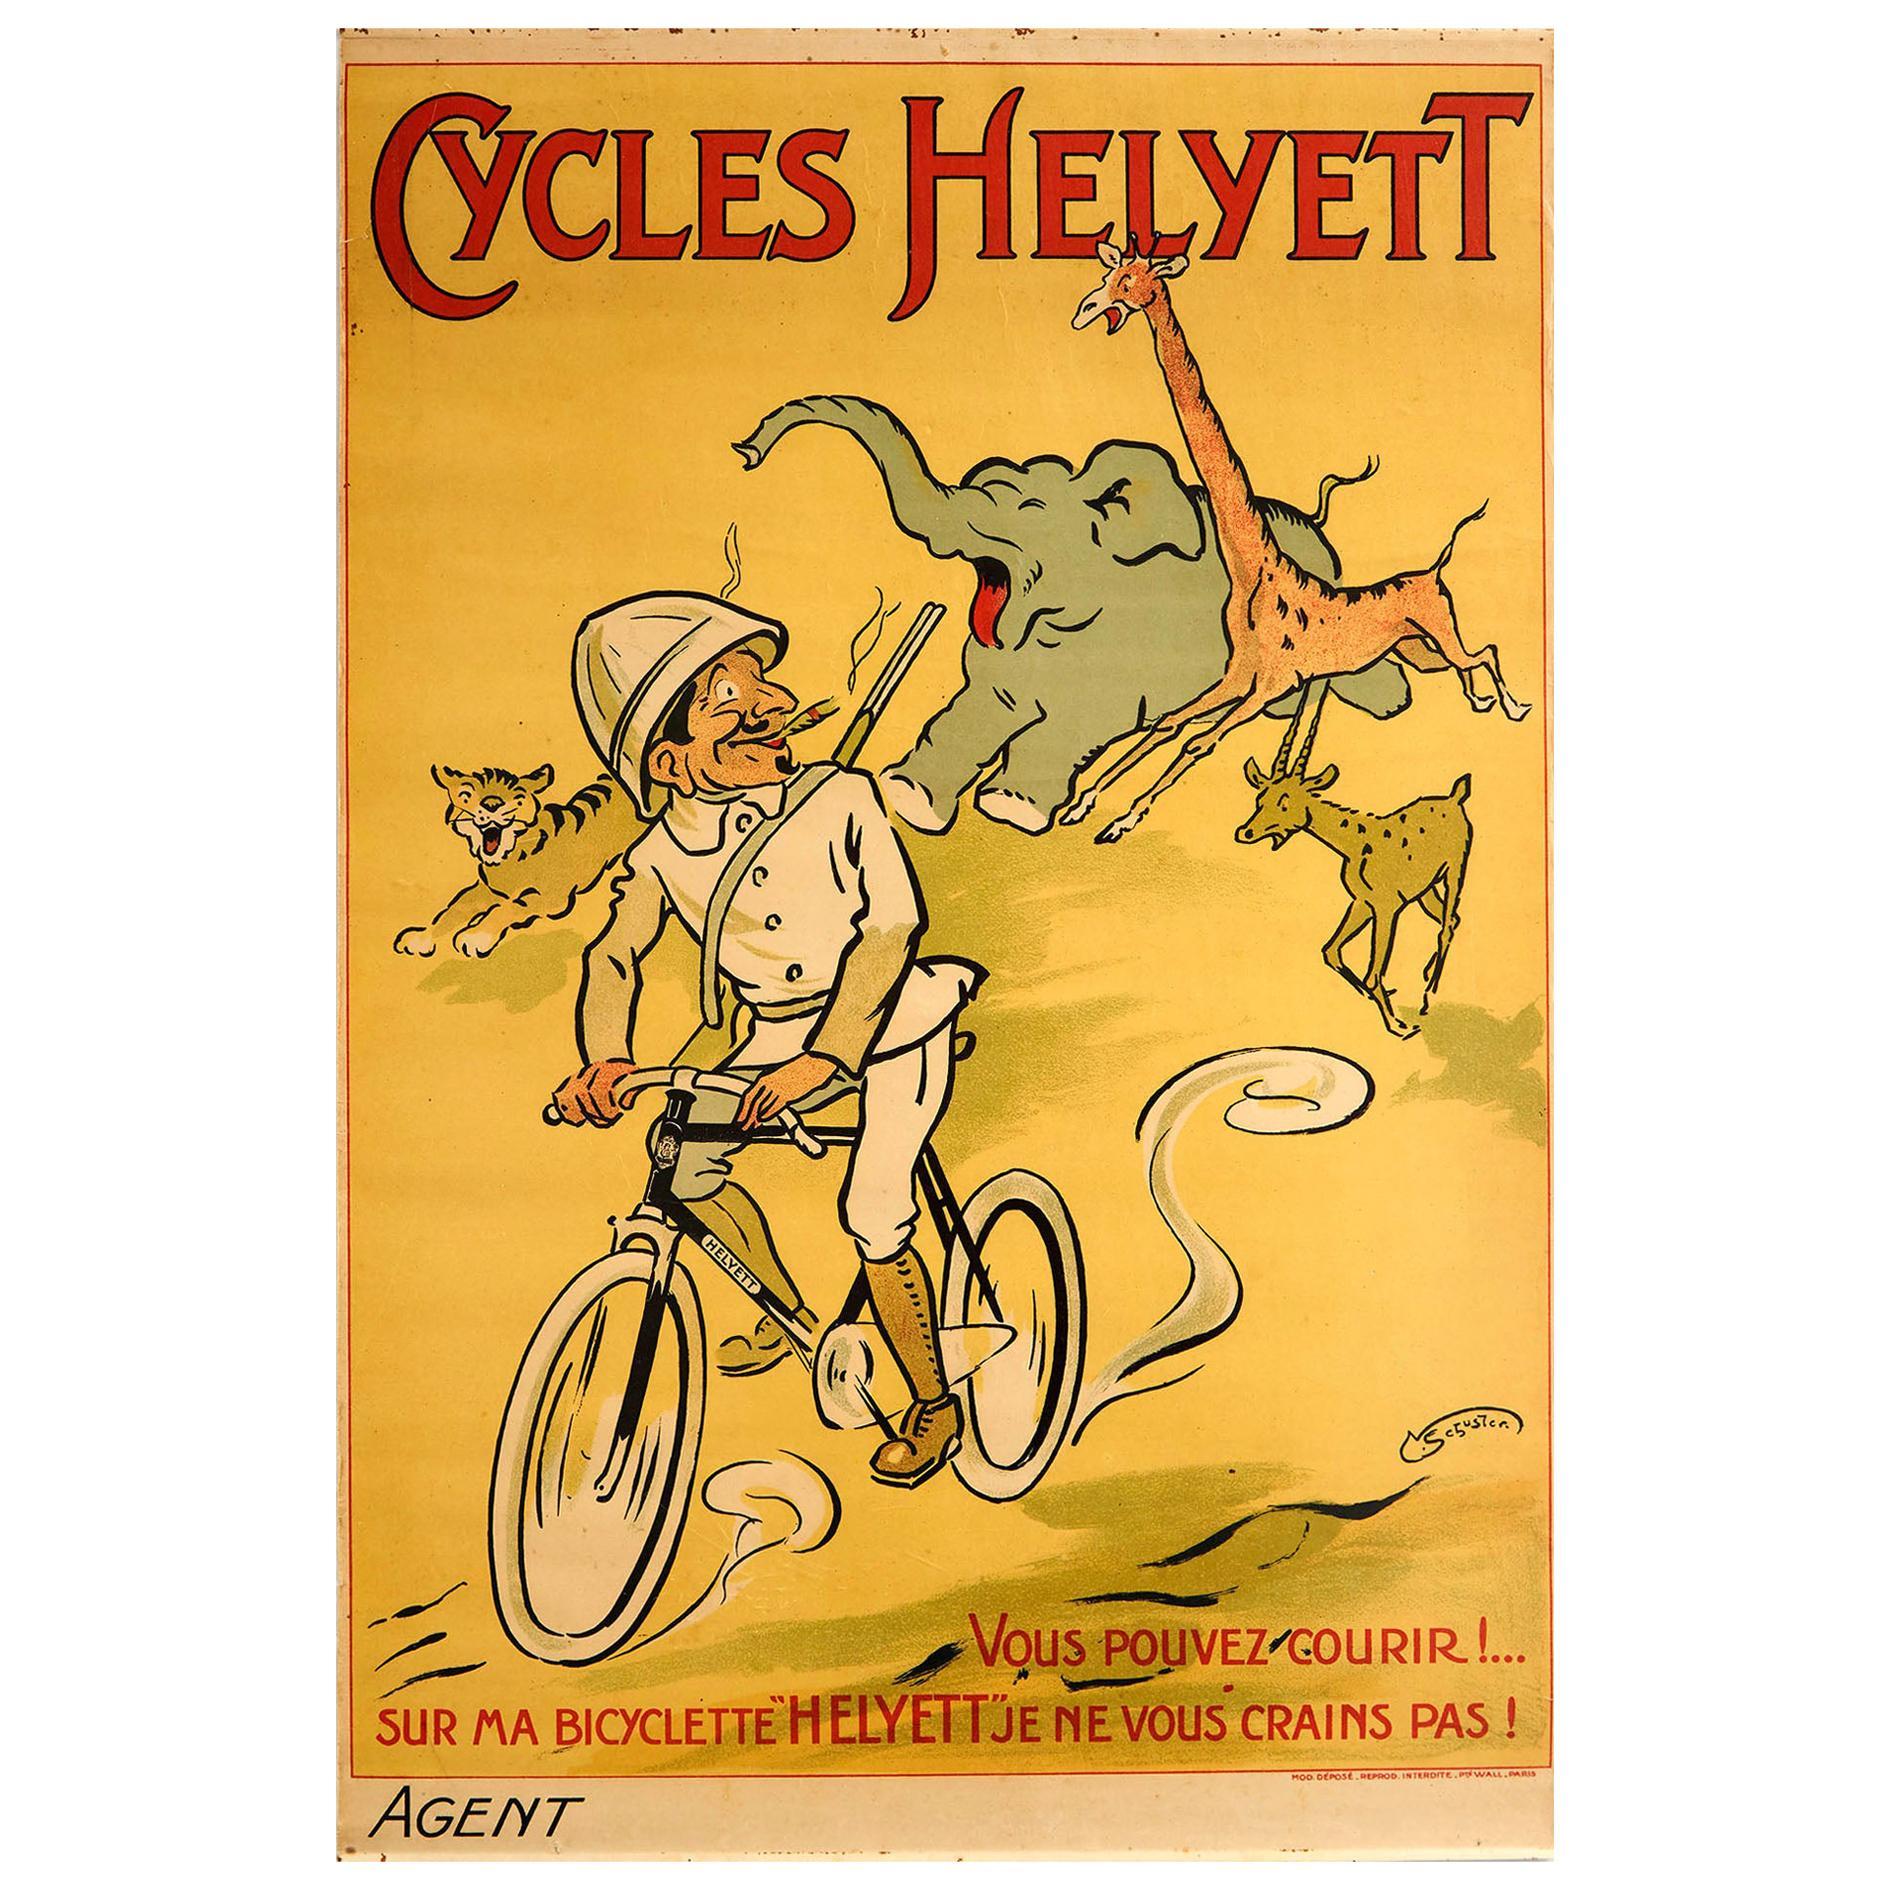 Original Antique Poster Cycles Helyett French Bicycle Safari Animals Design Art